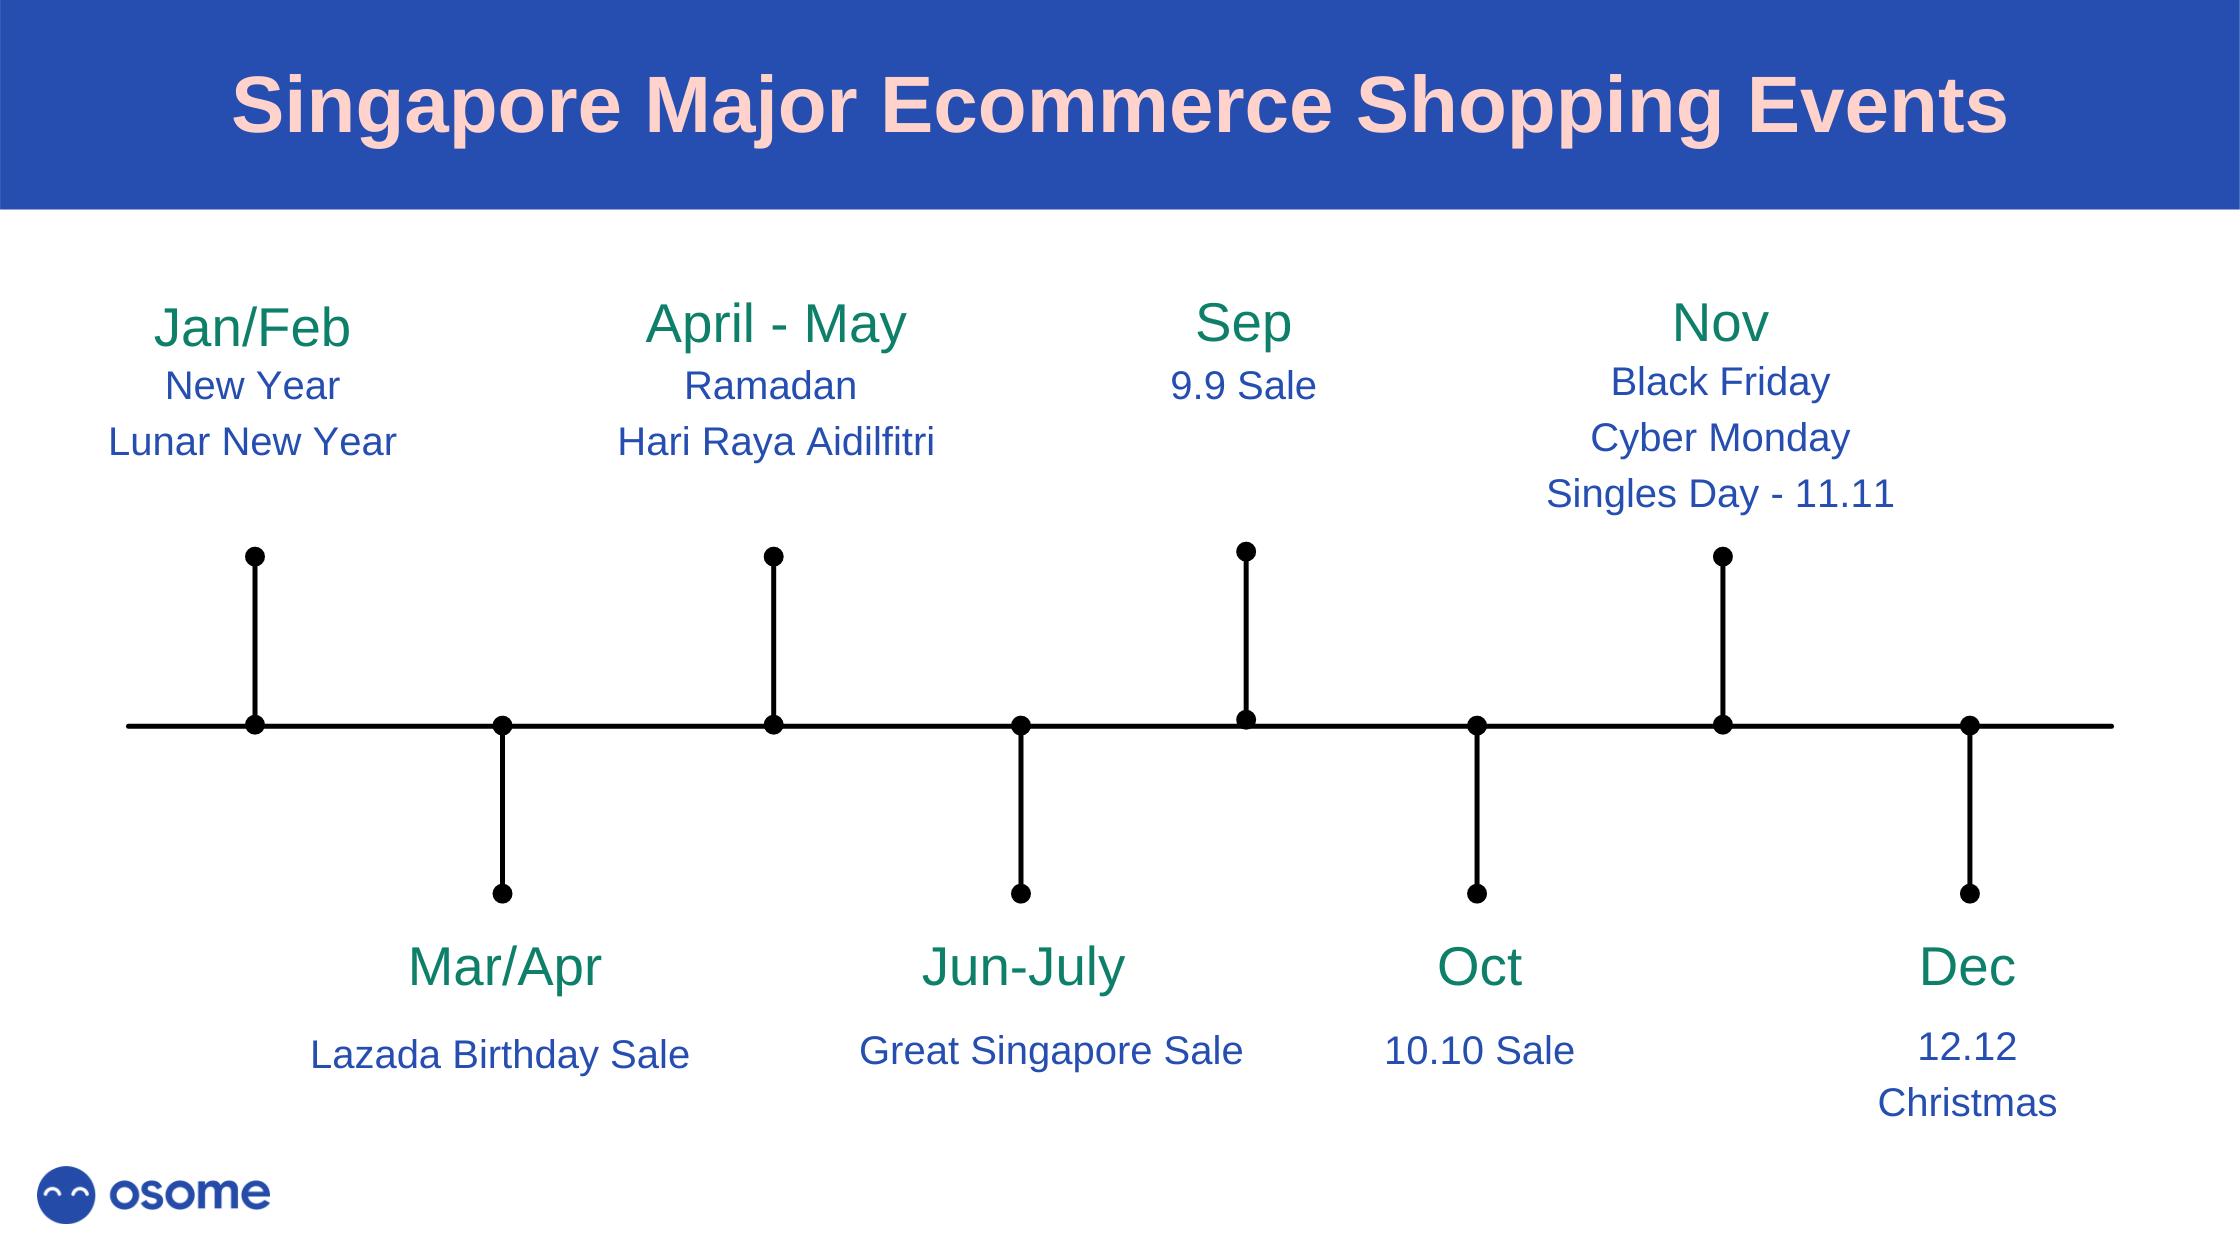 Singapore Major Ecommerce Shopping Events